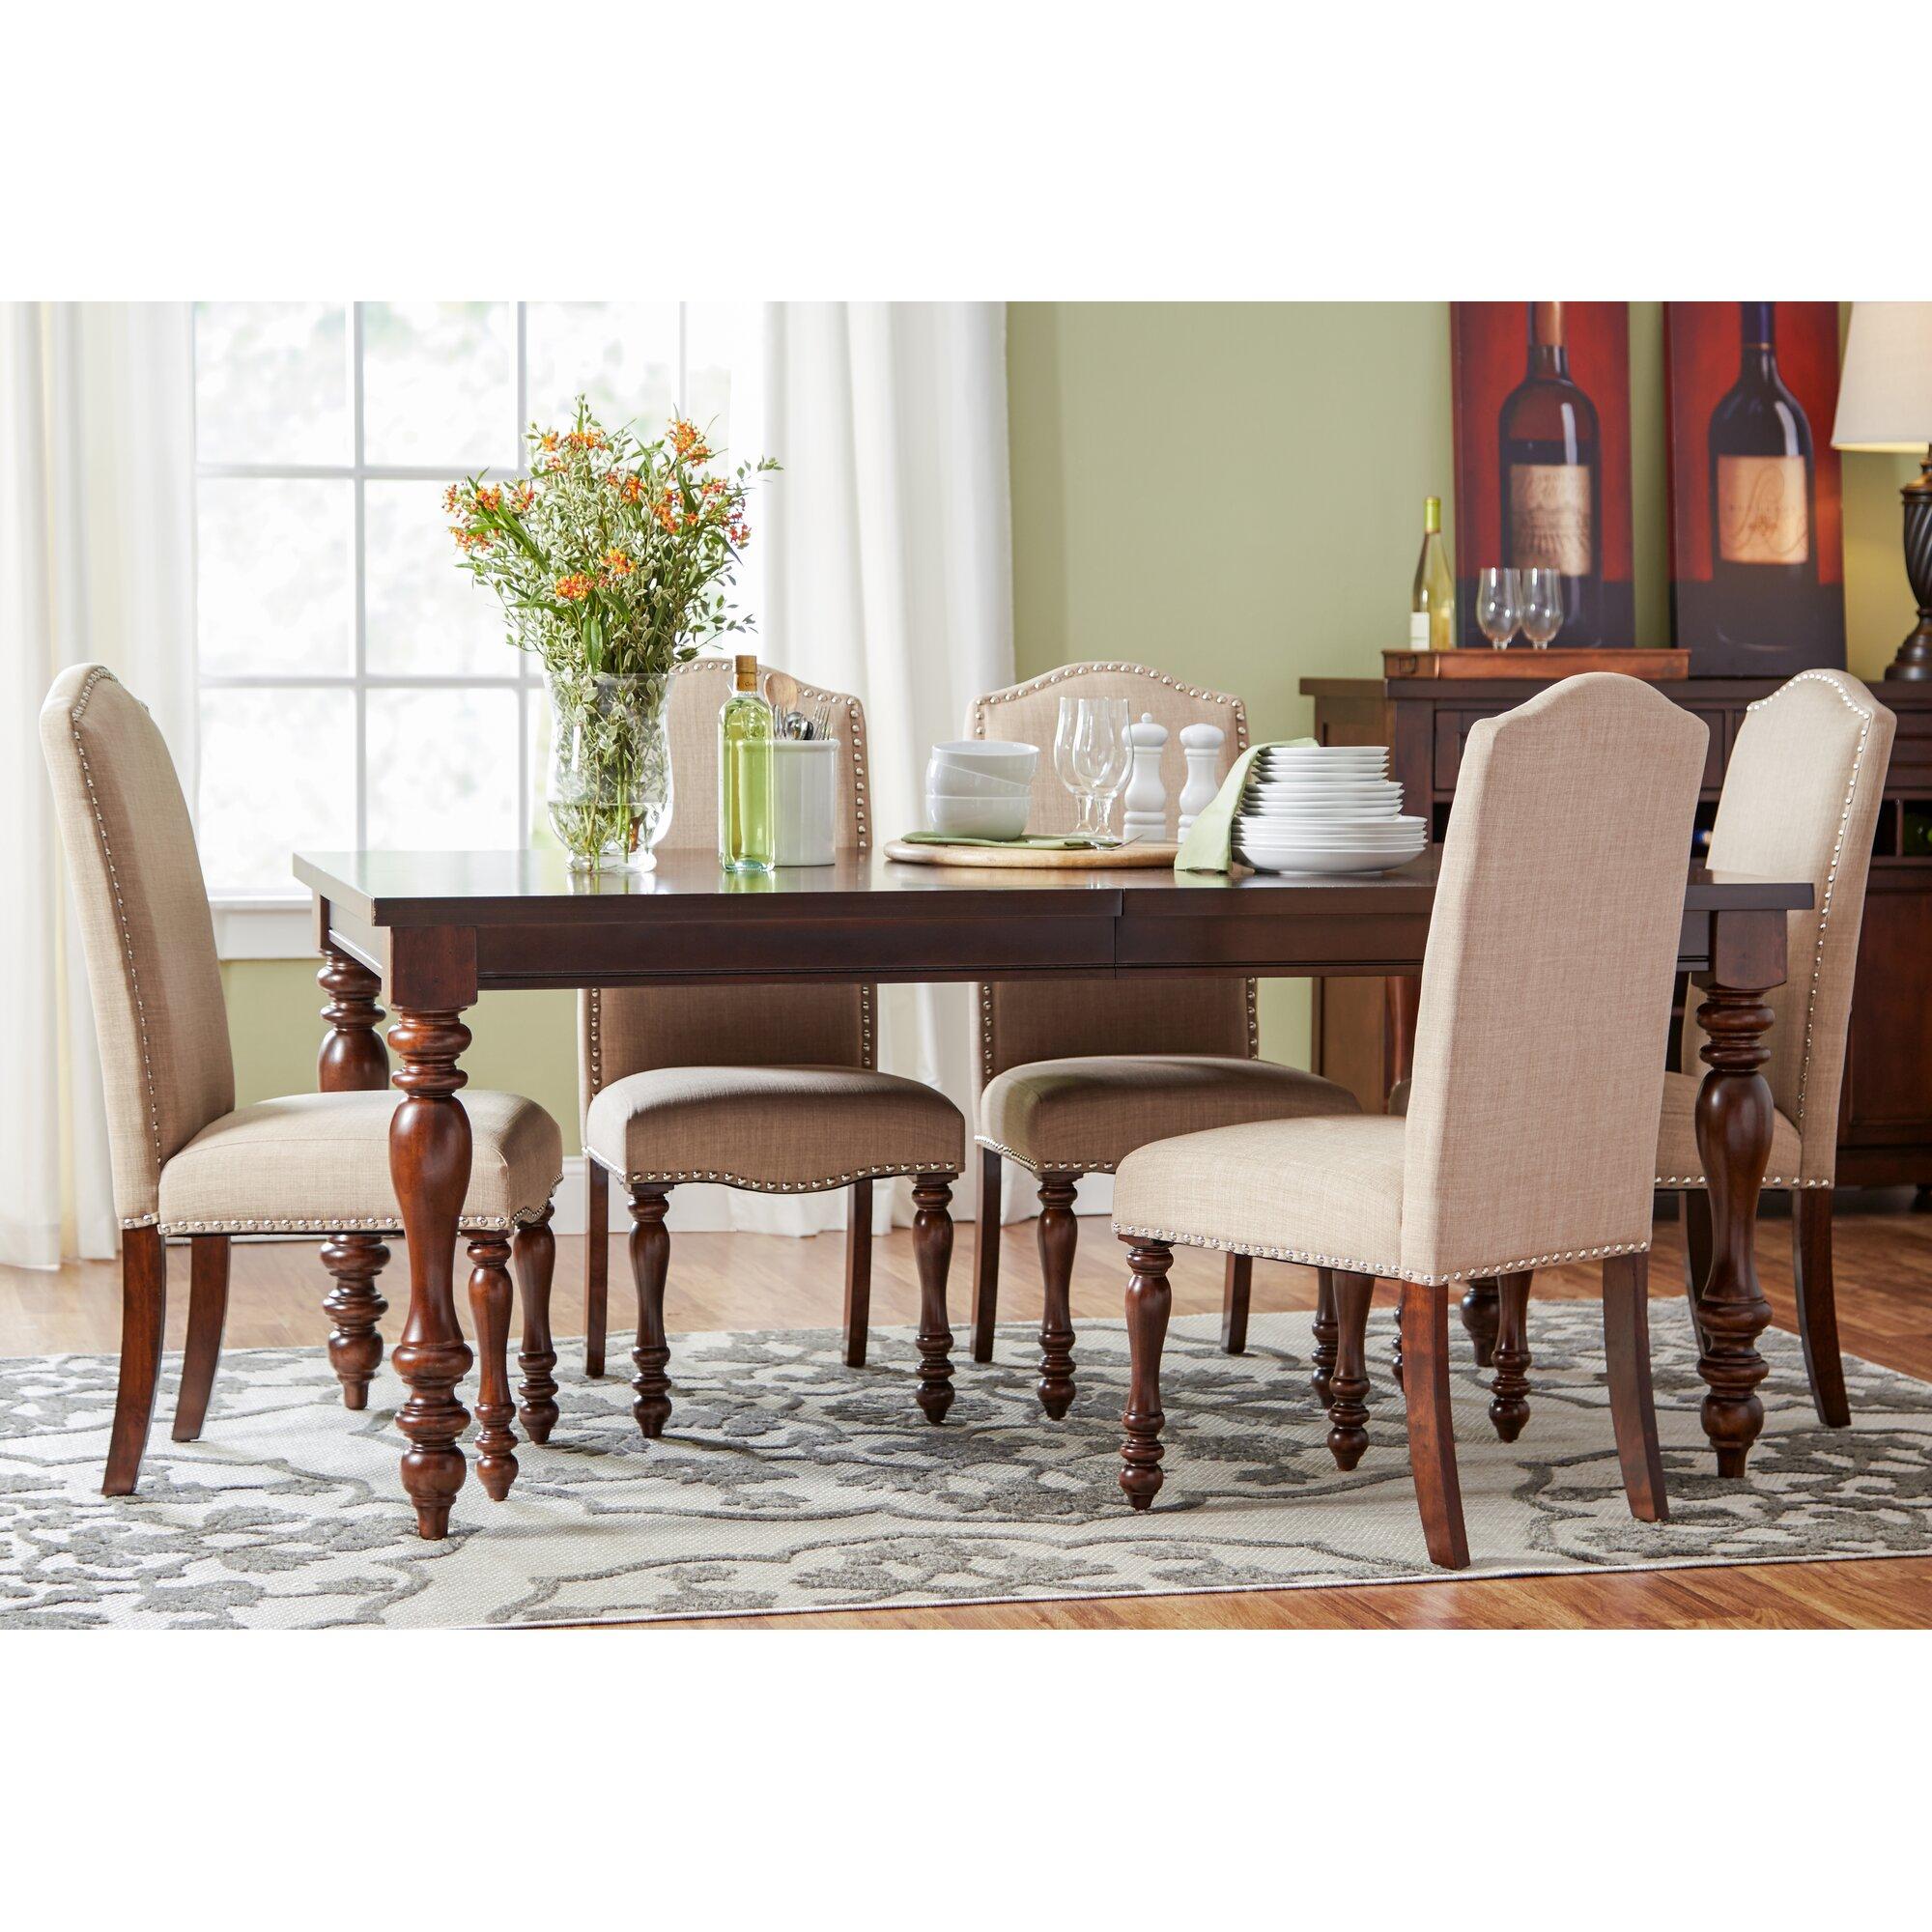 Three Posts™ Lanesboro 7 Piece Dining Set & Reviews | Wayfair